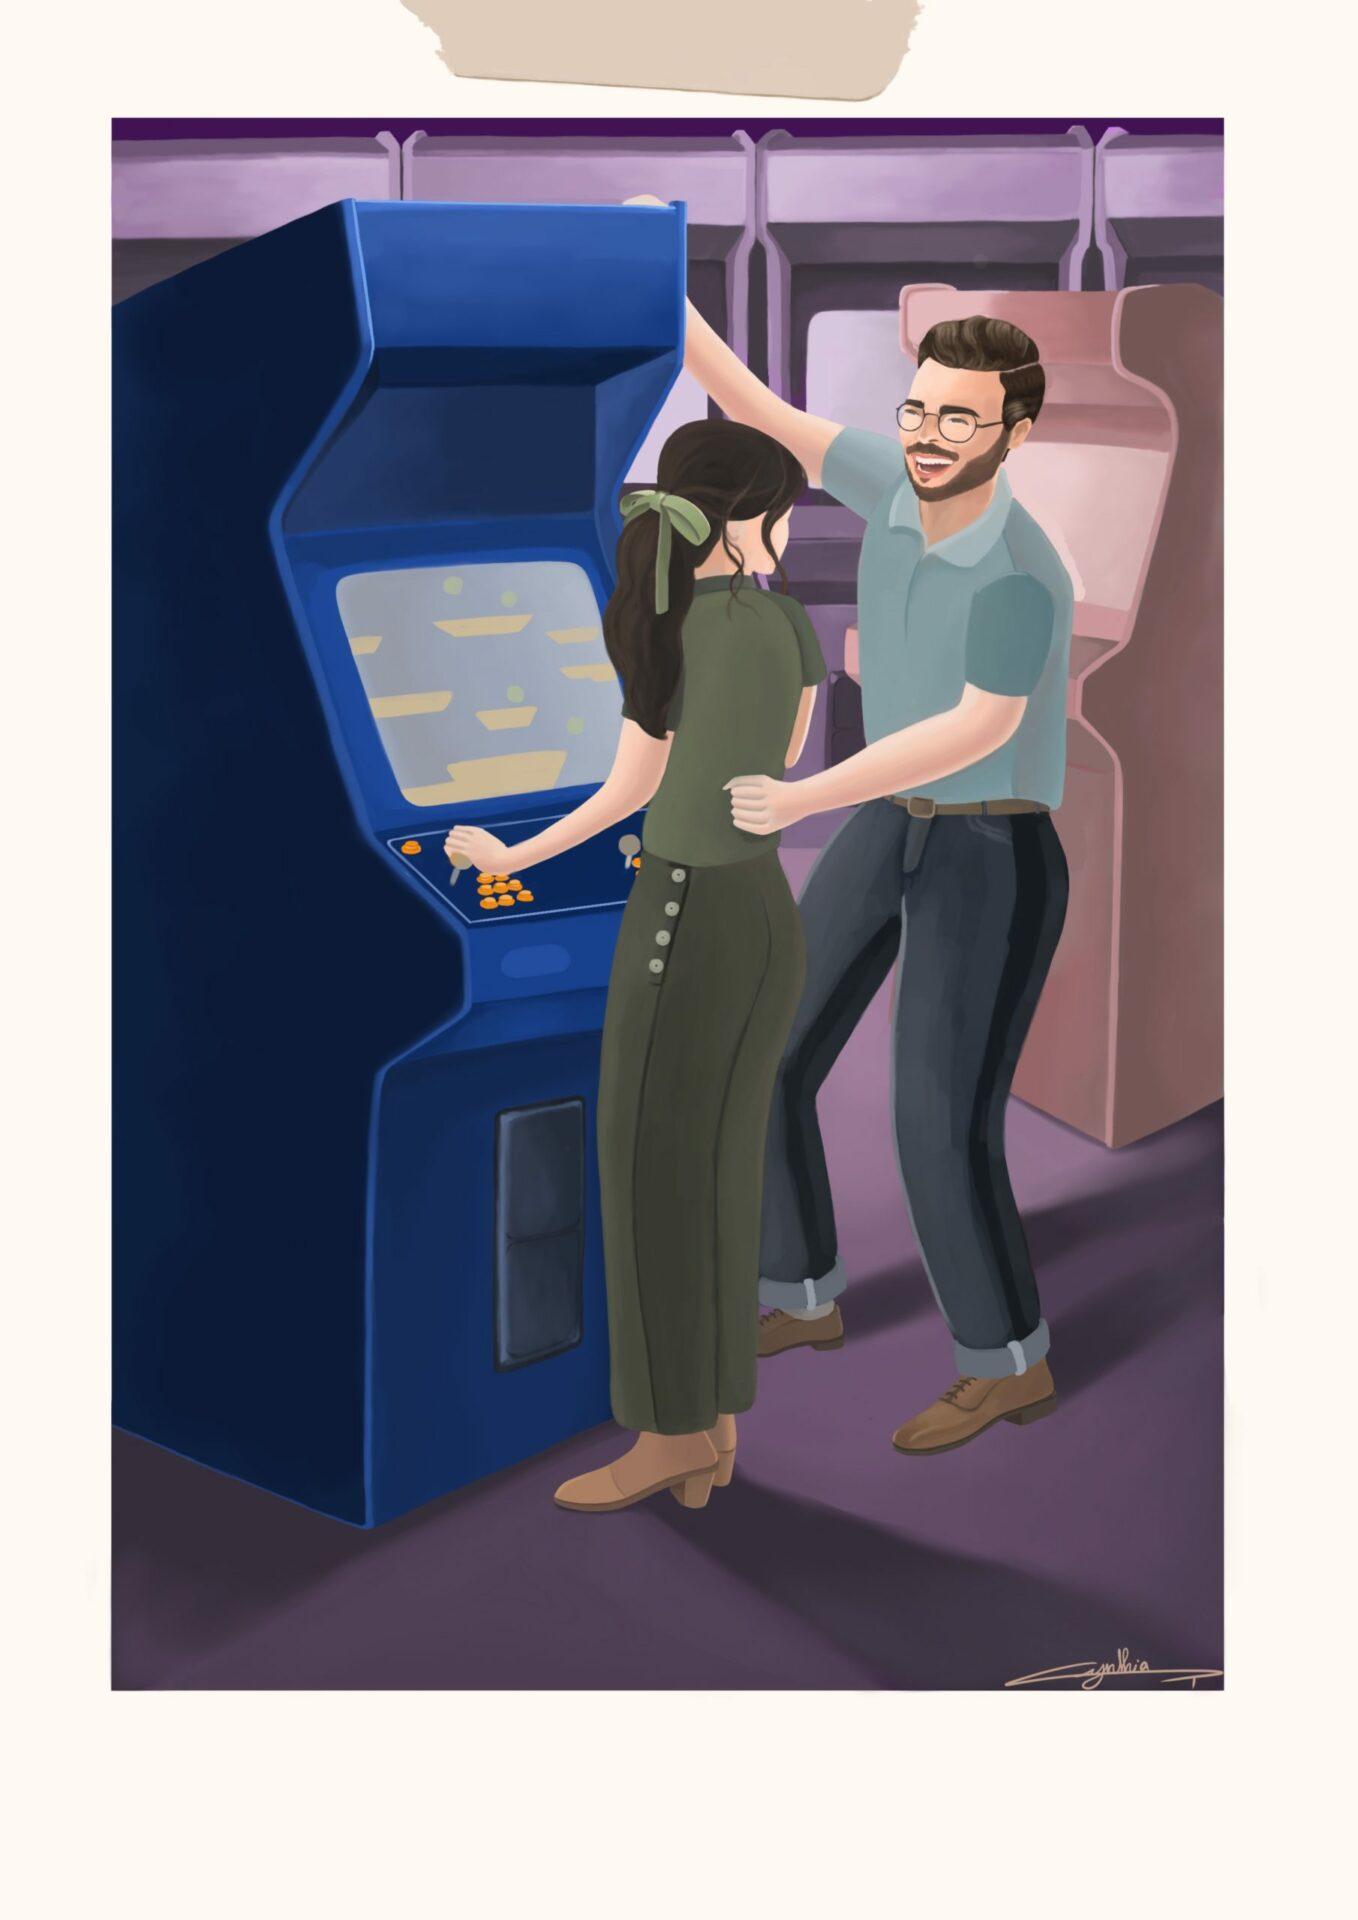 Jeux d'arcade illustration de Cynthia Artstudio